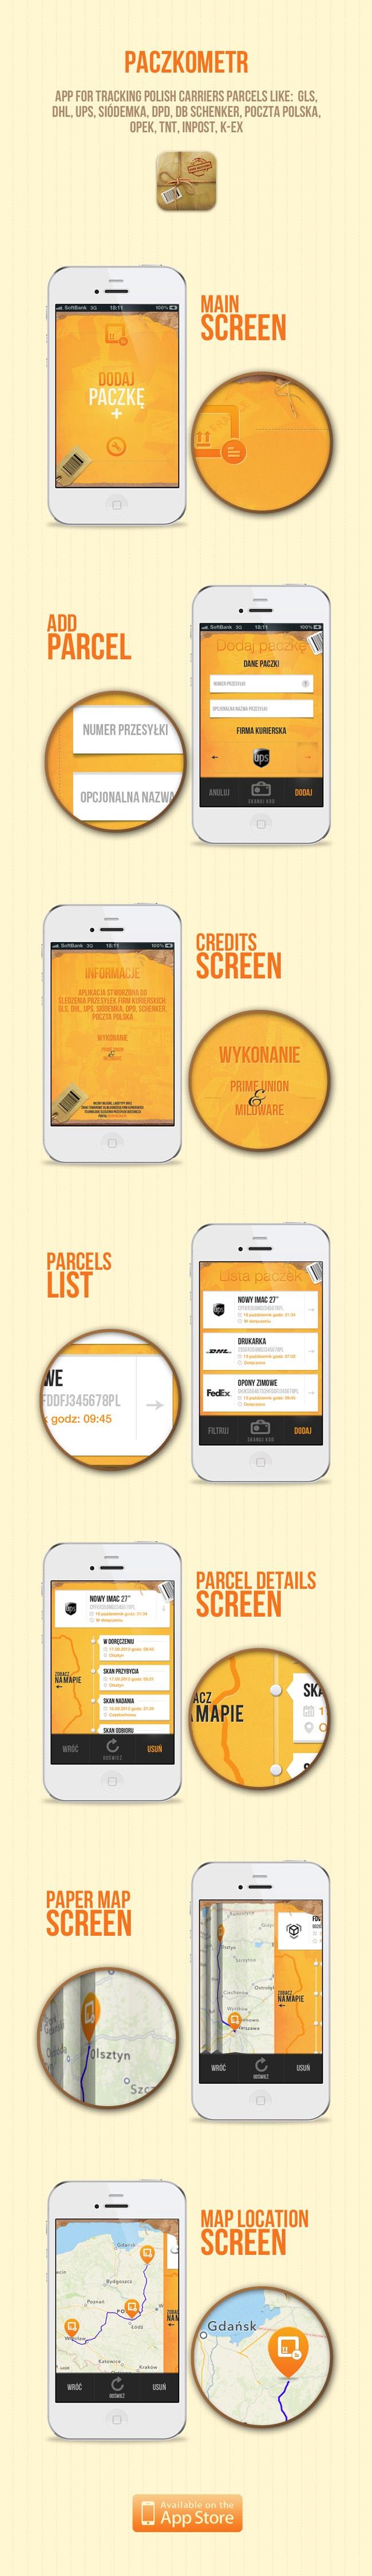 Paczkometr app by Lukasz Sokol, via Behance